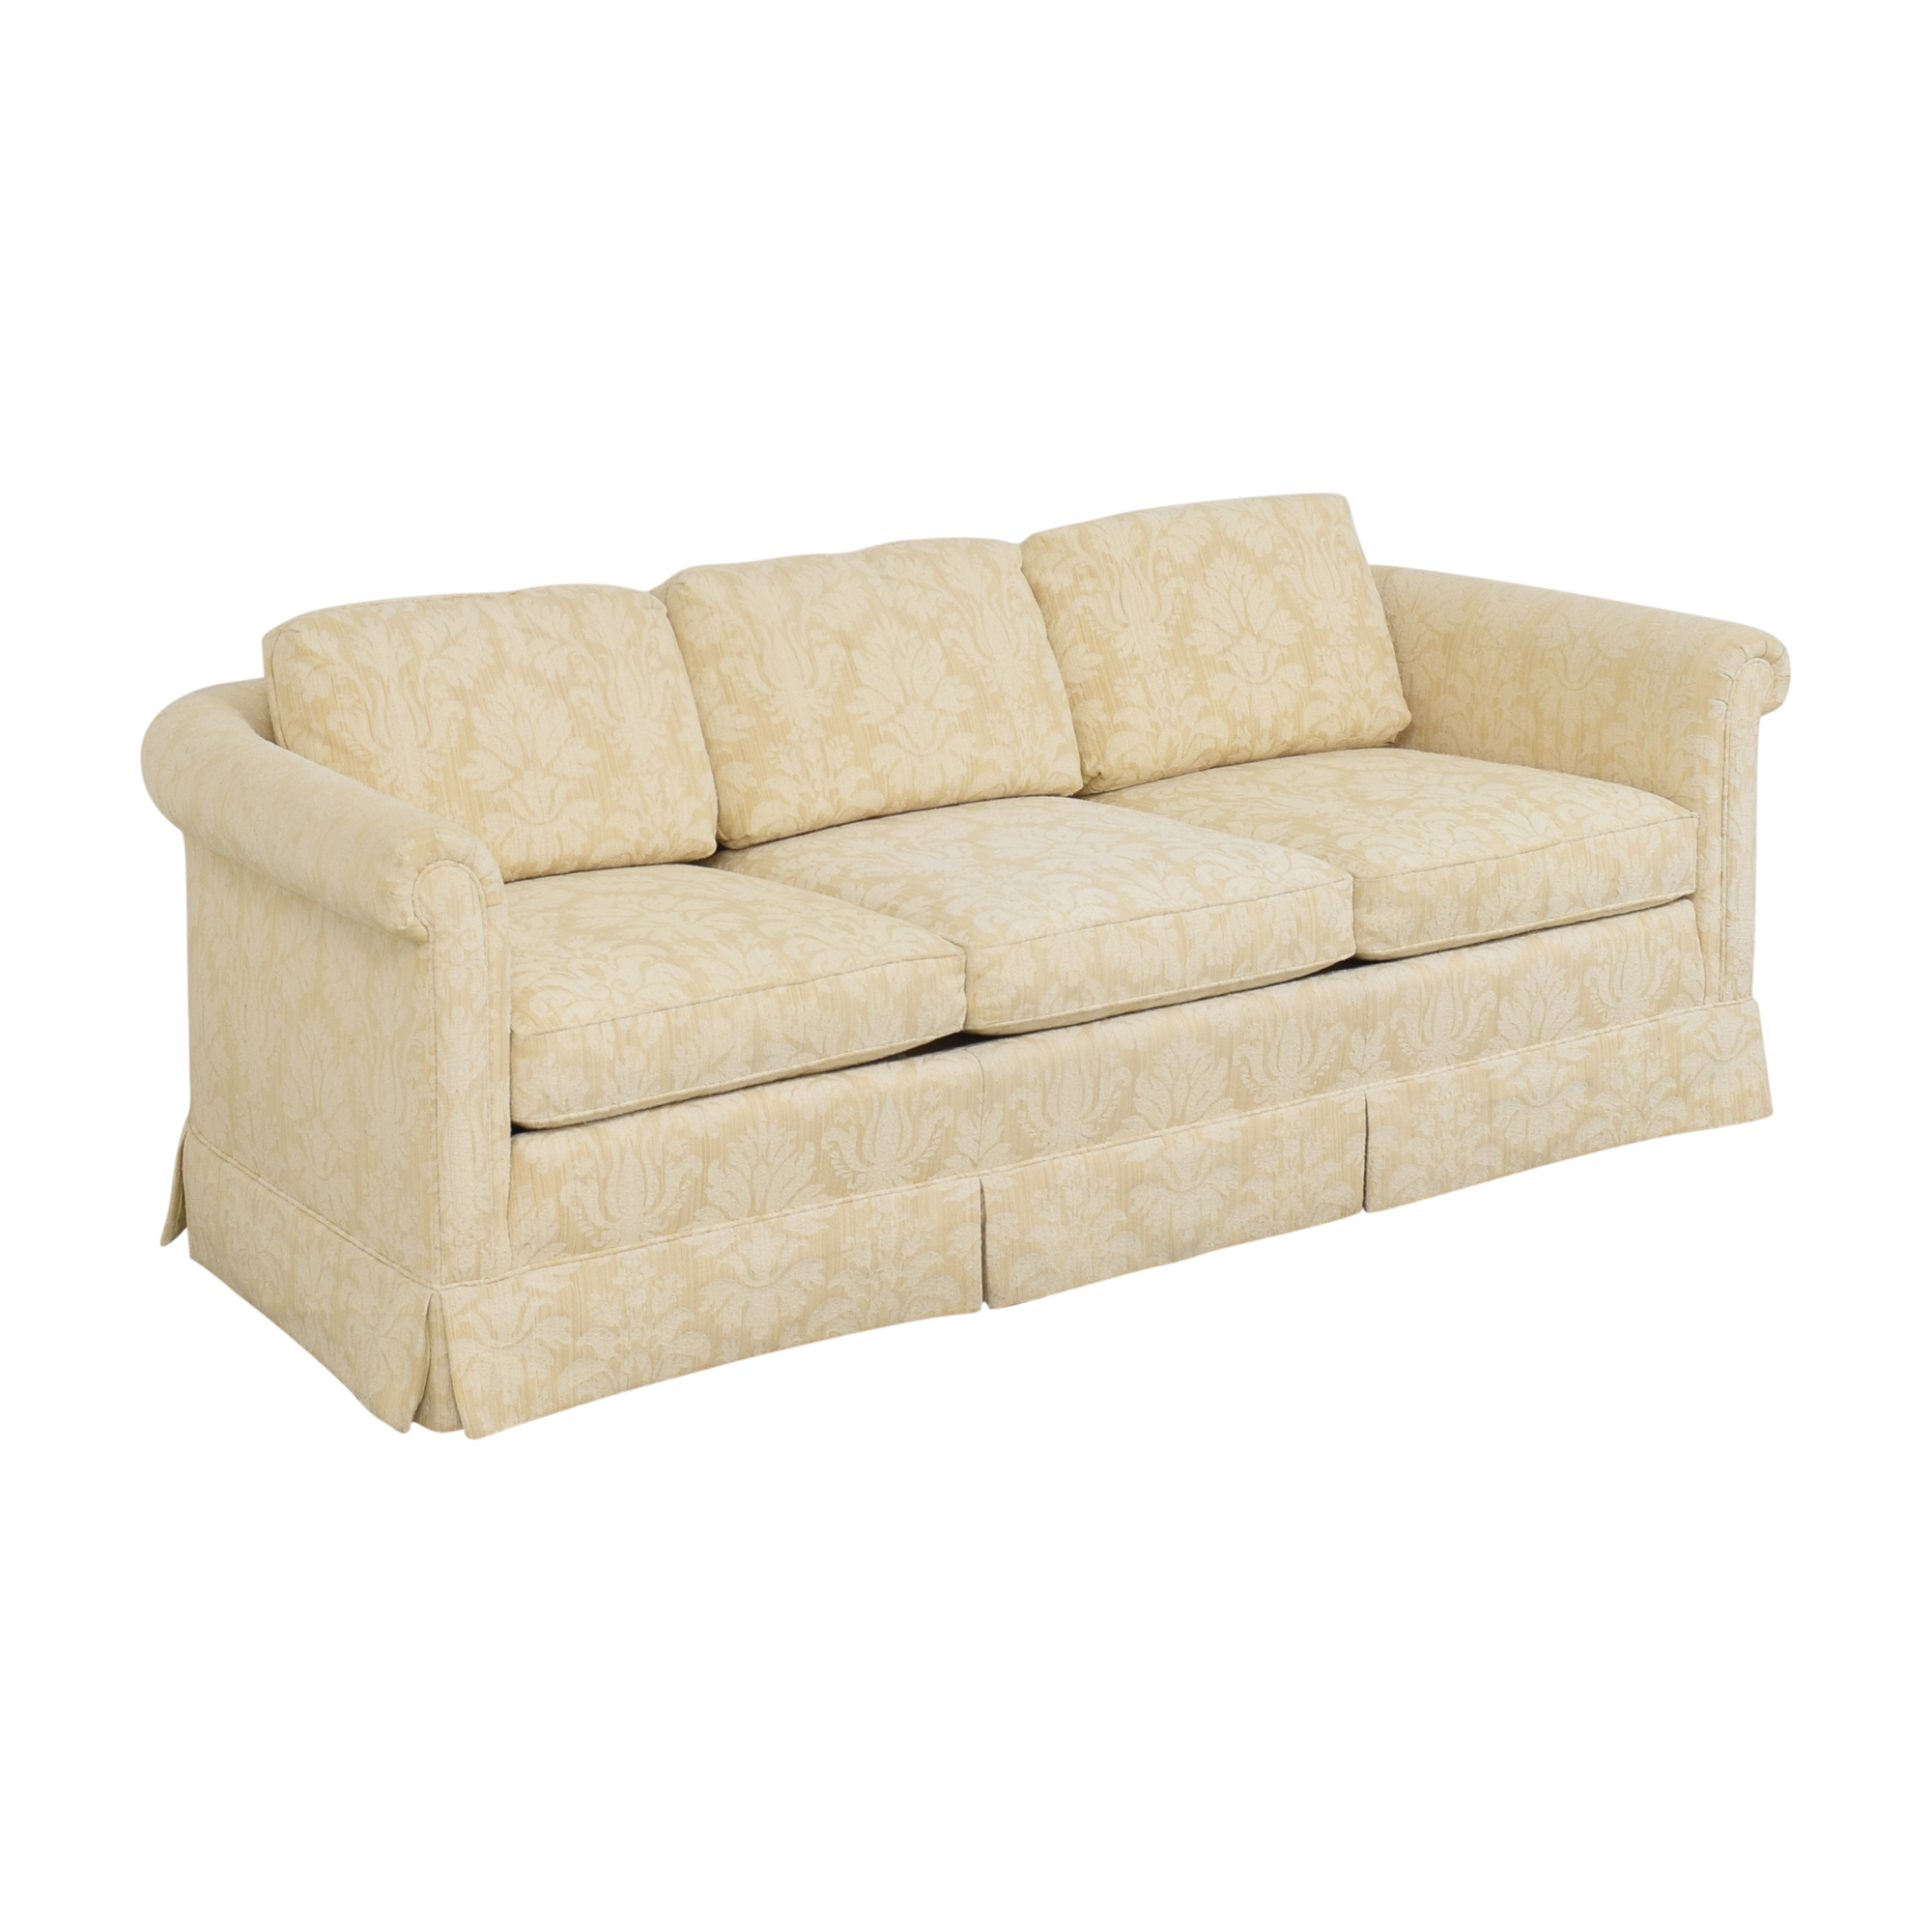 buy Baker Furniture Skirted Damask Sofa Baker Furniture